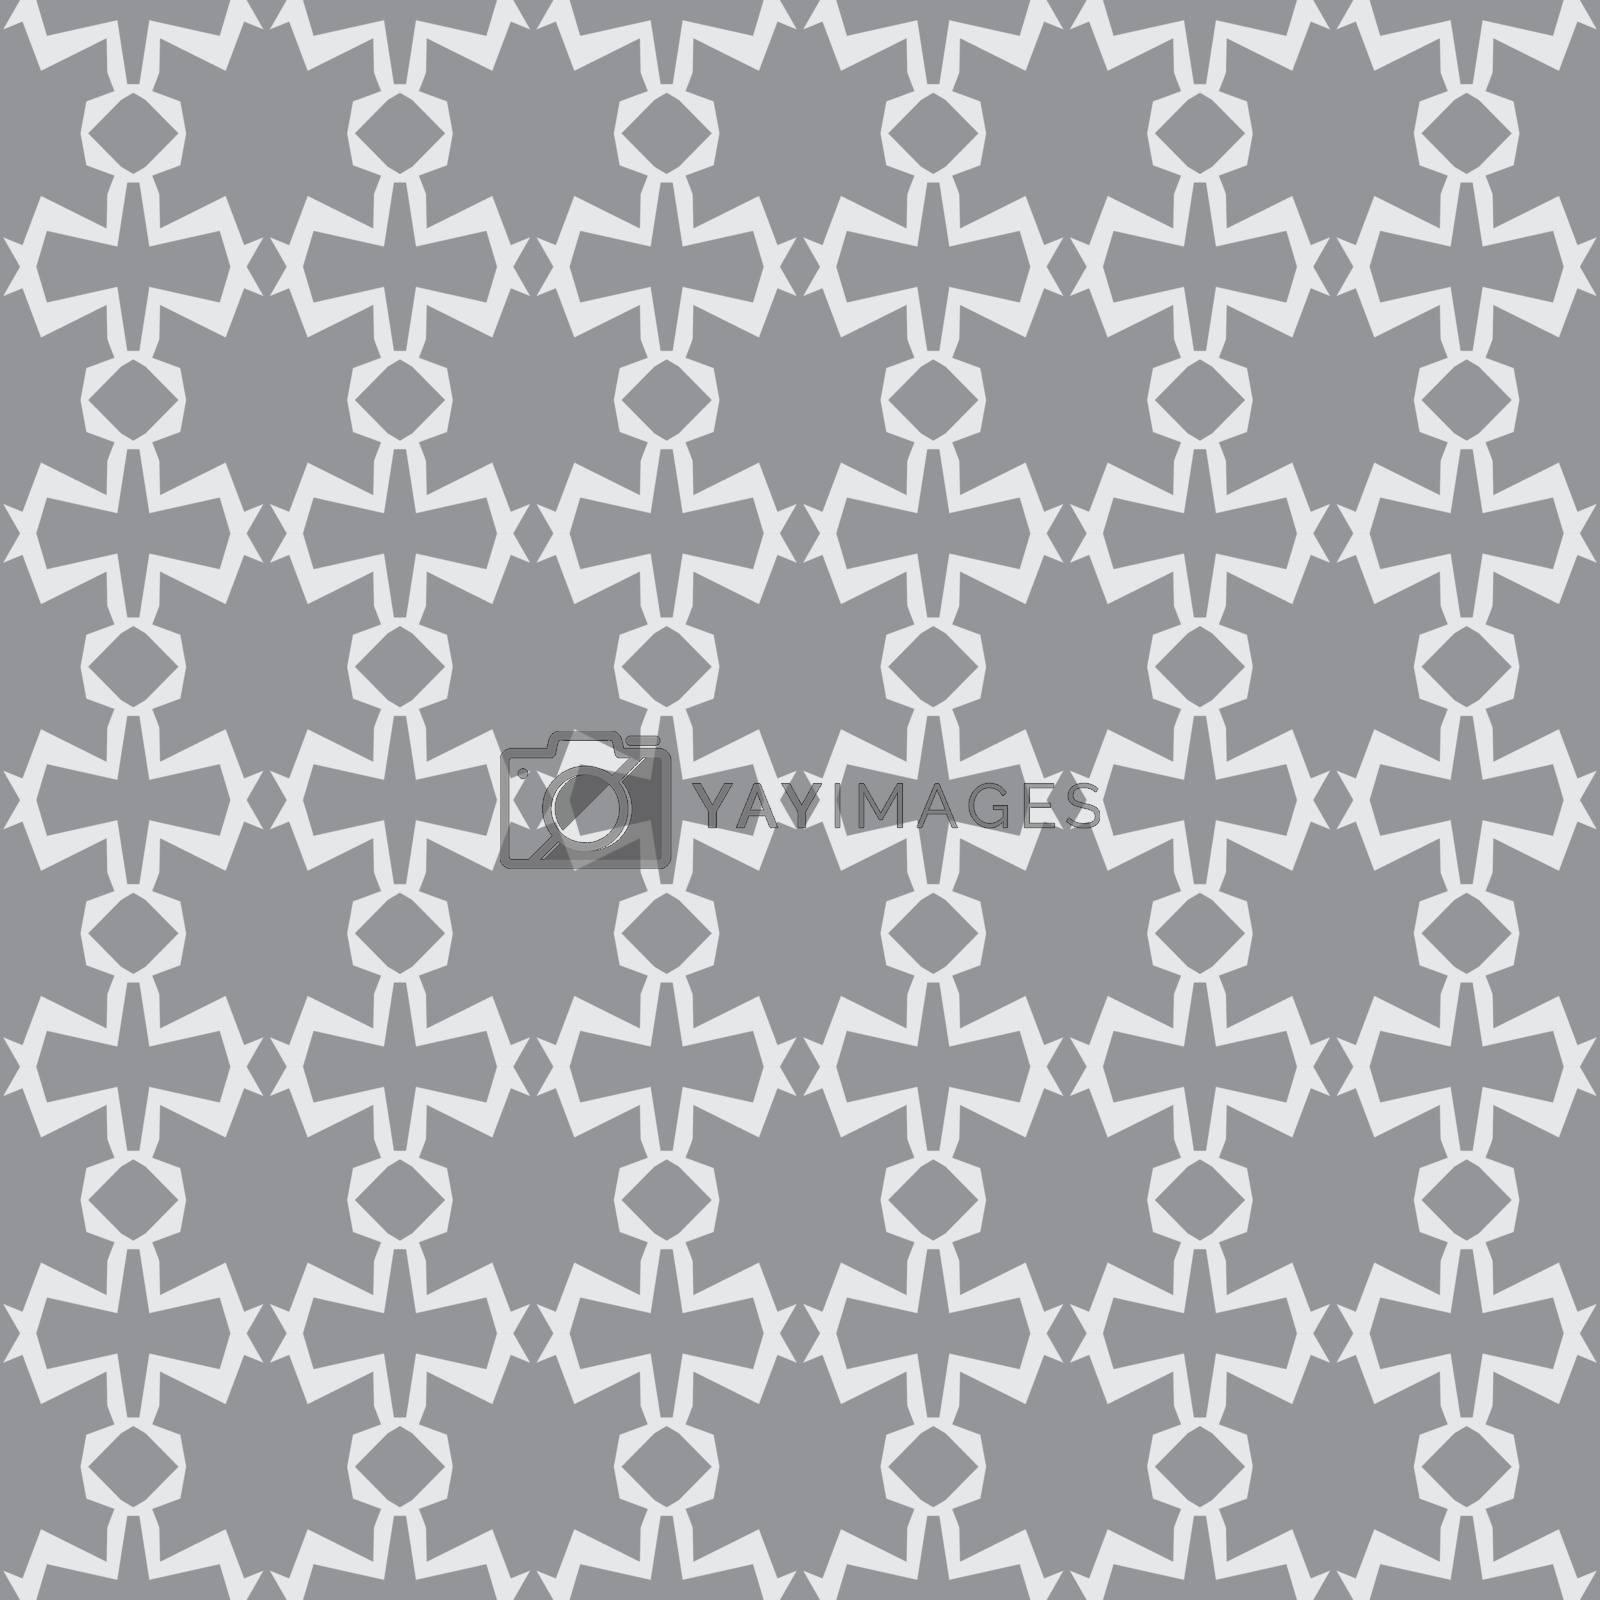 Seamless vector wallpaper. blue geometric repetitive print